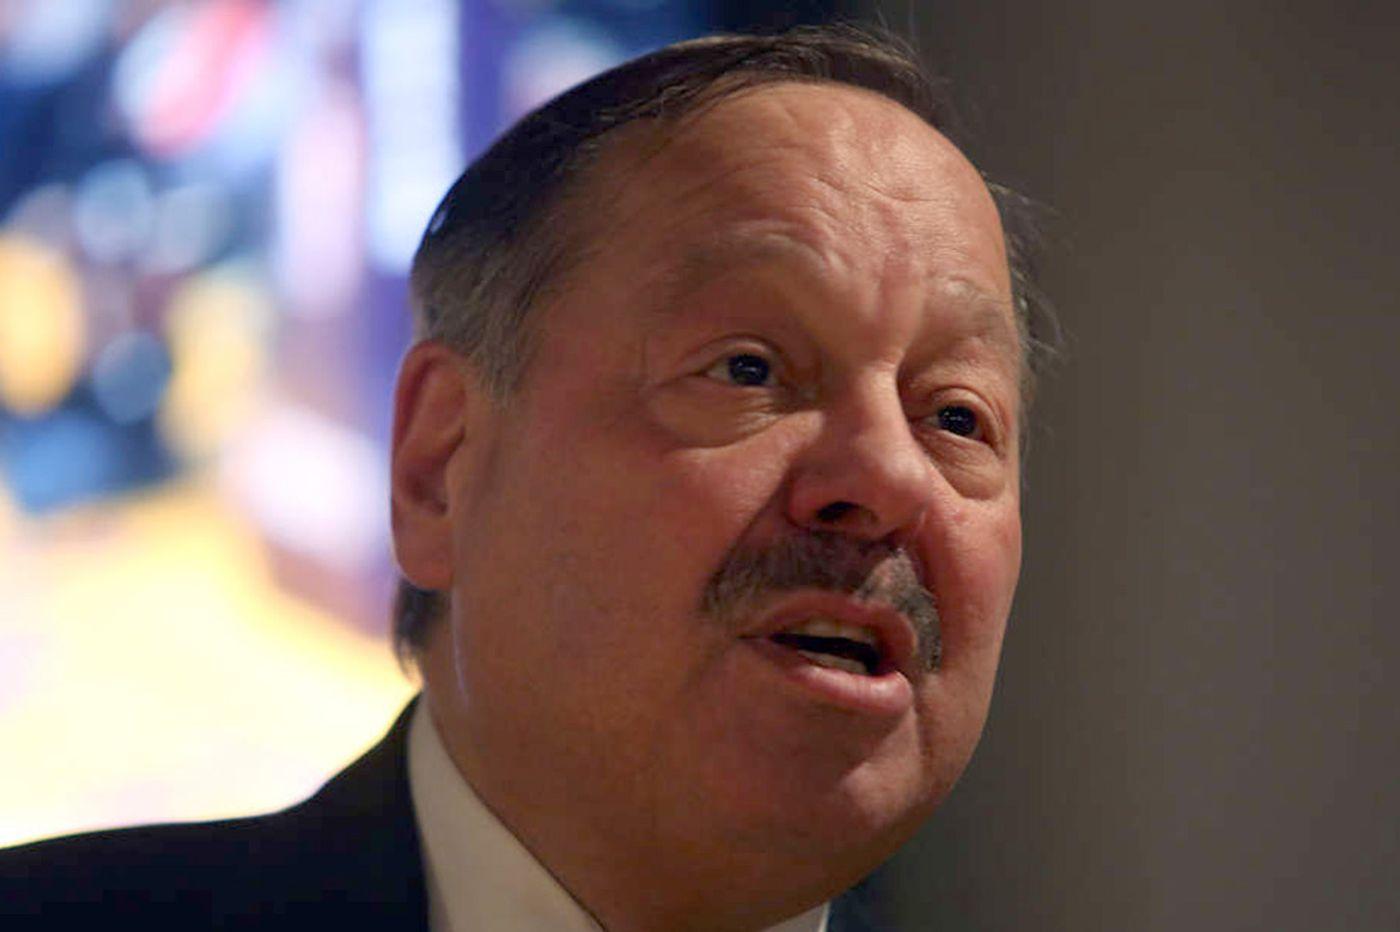 Ferrick: Diaz's proposals have no chance with state legislature